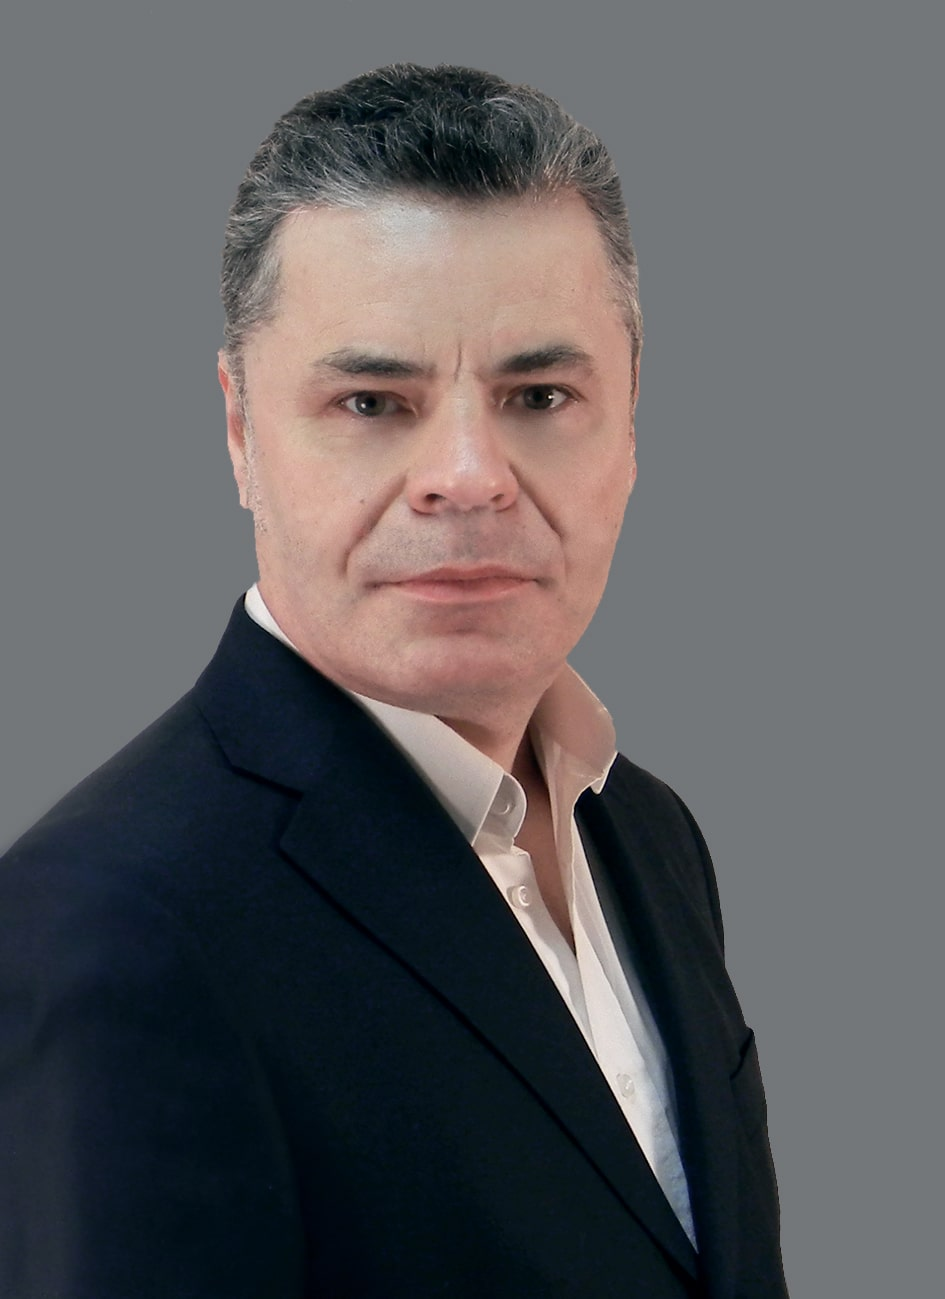 Дмитрий Степанович Дружинин